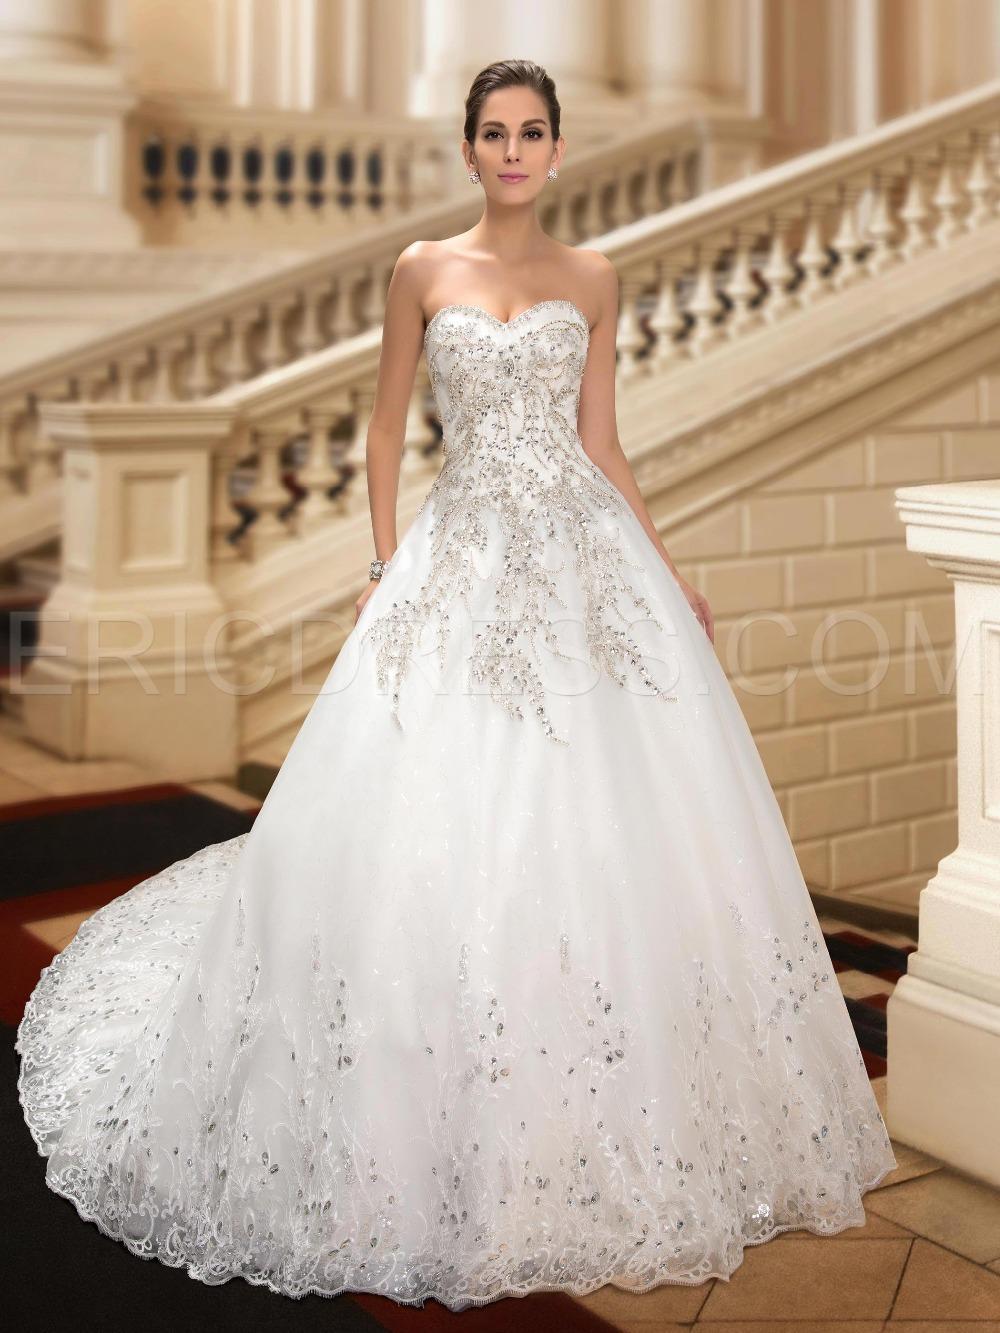 sparkly ball gown wedding dresses - Design Your Wedding Dress